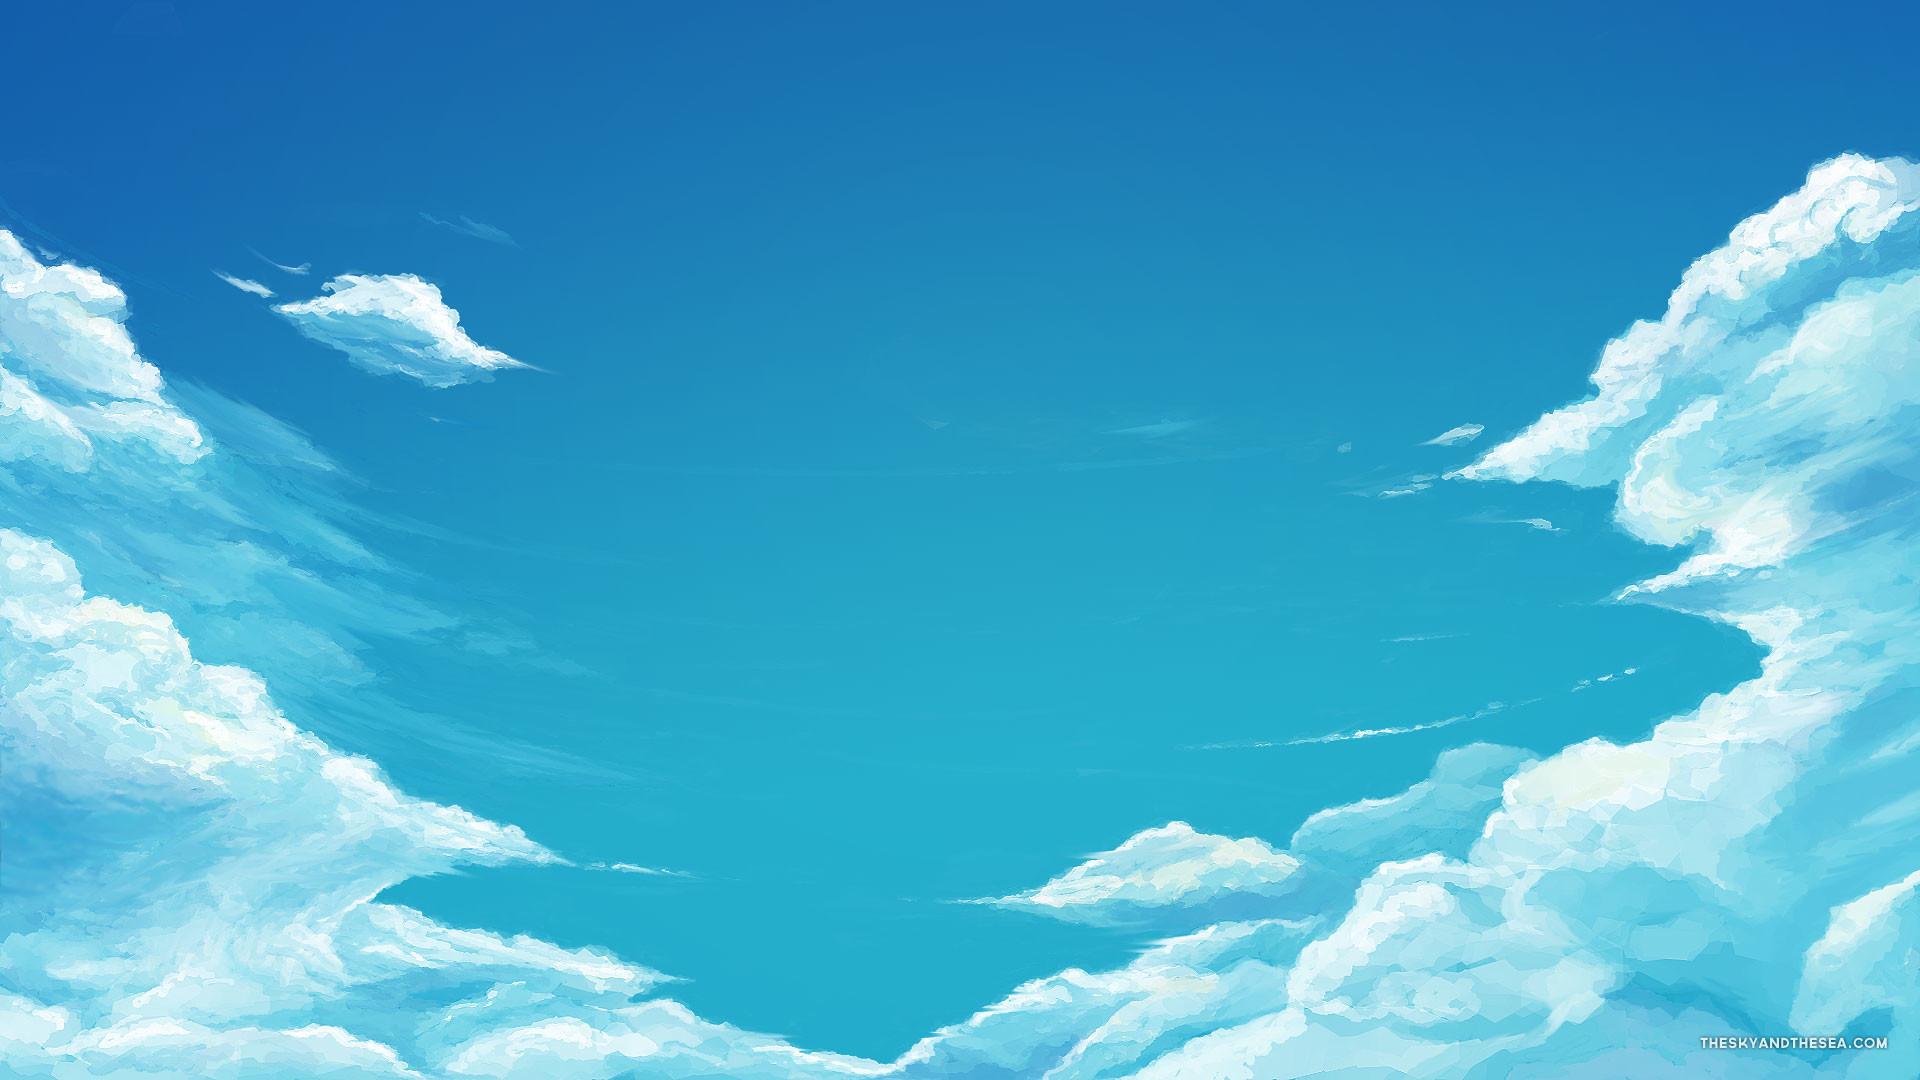 Blue Sky Wallpaper Background 64 Images